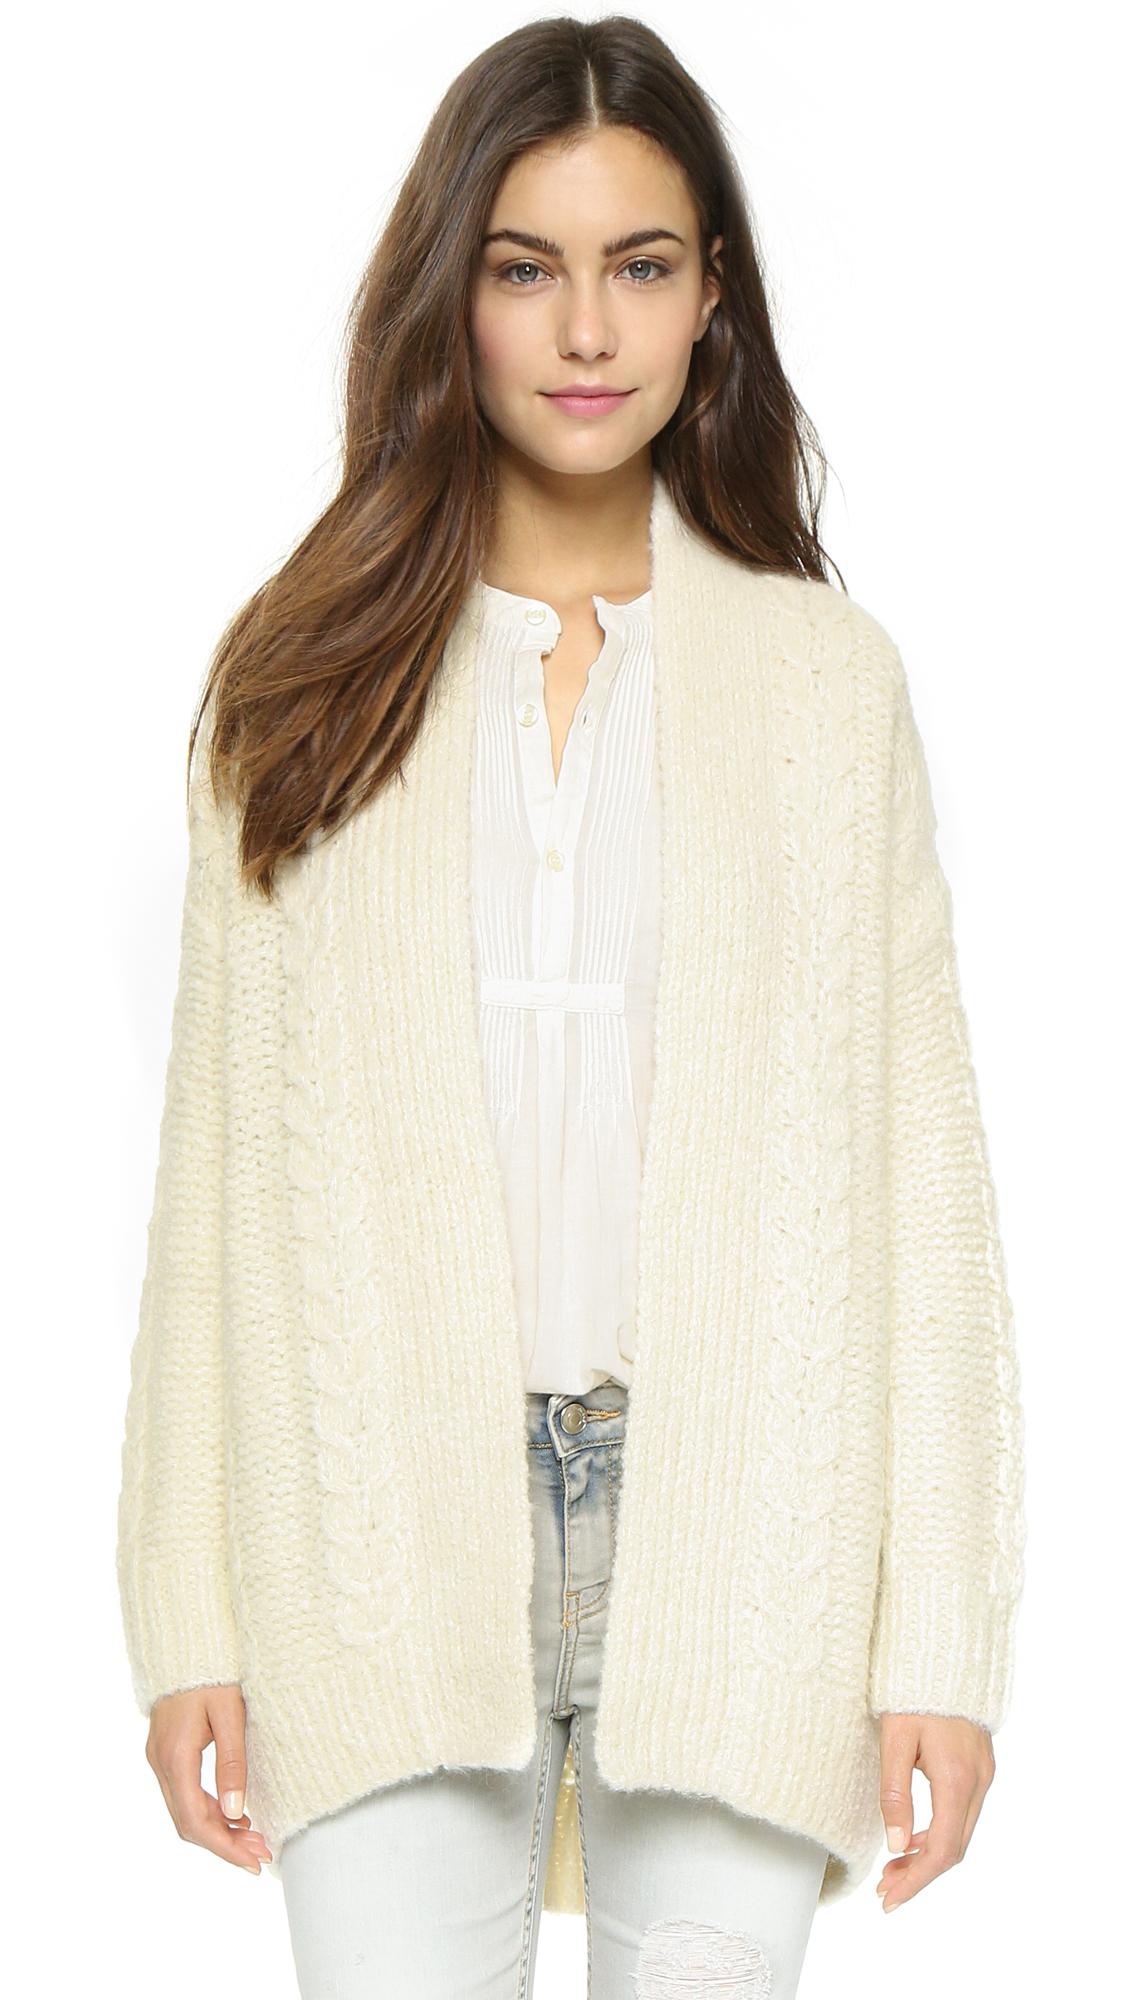 Nili lotan Long Sleeve Kimono Cardigan Sweater - Ivory in White | Lyst